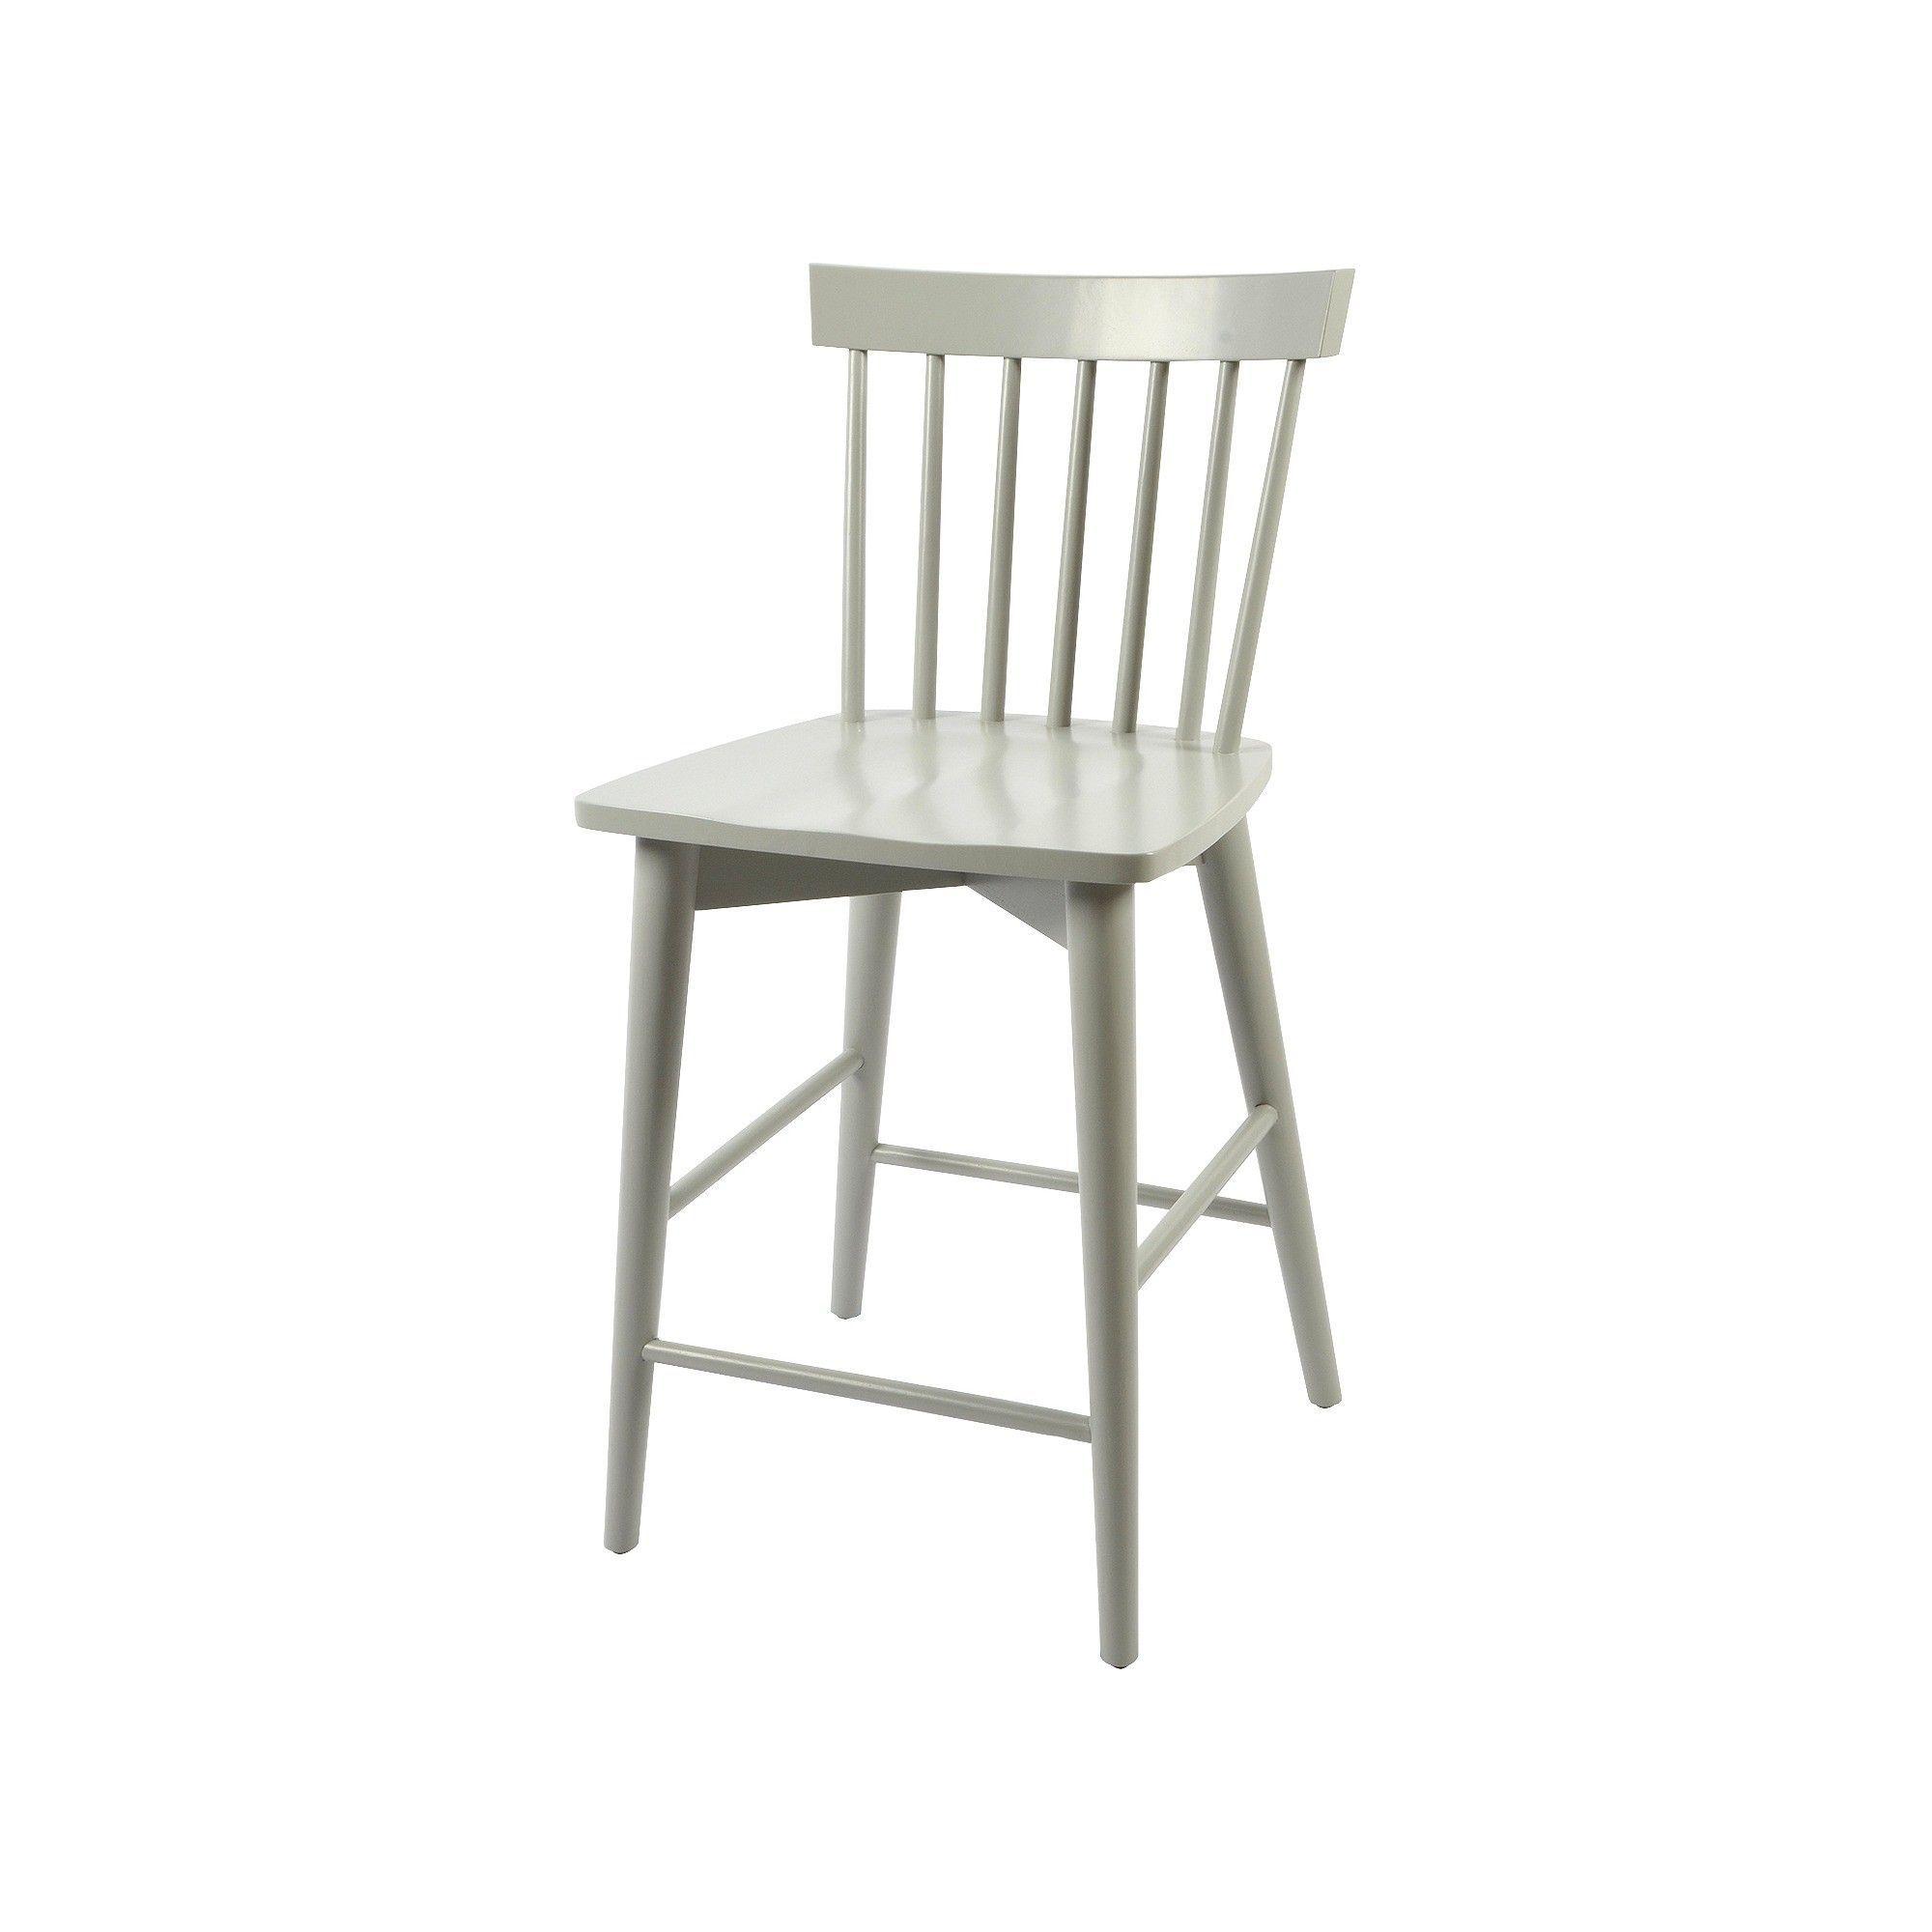 Fantastic 24 Windsor Counter Stool Hardwood Threshold Products Camellatalisay Diy Chair Ideas Camellatalisaycom